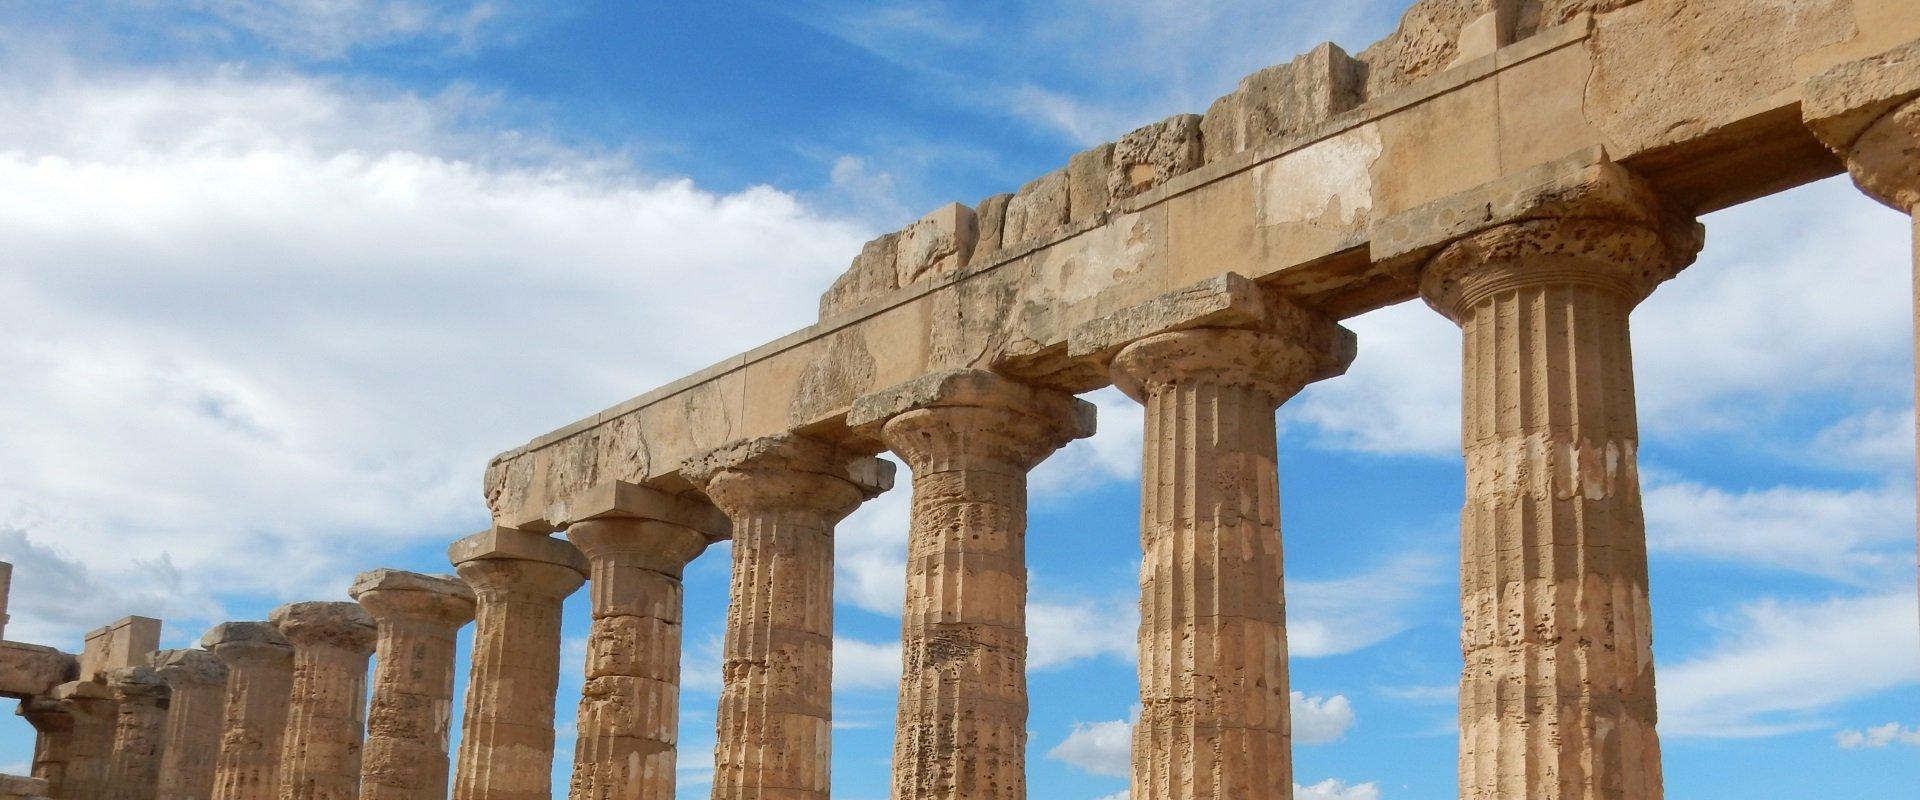 tempel-selinunte-sicilie.jpg